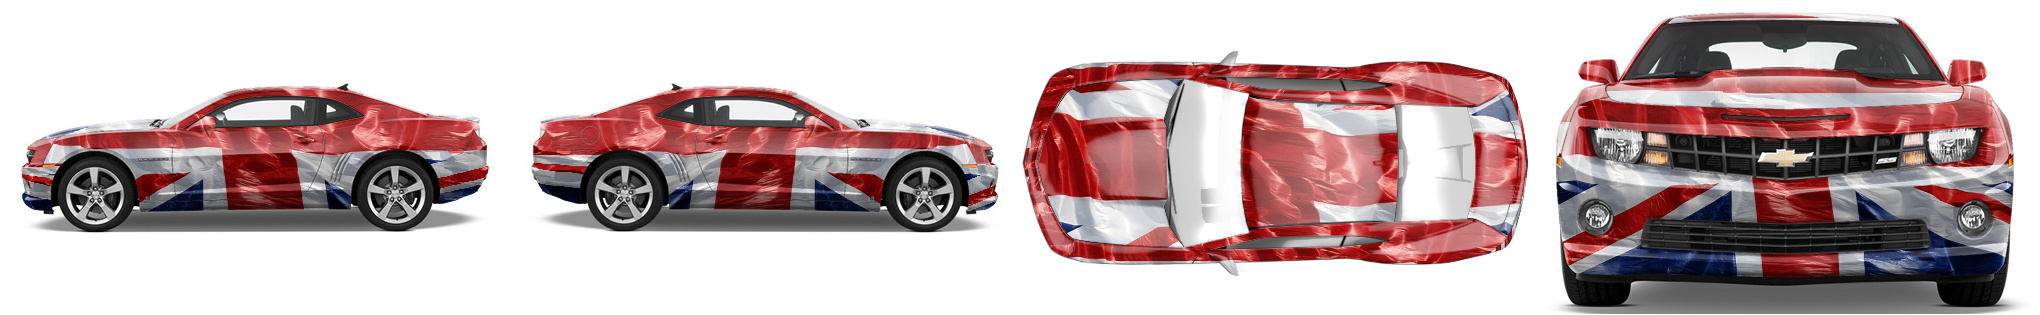 Muscle Car Wrap #1178